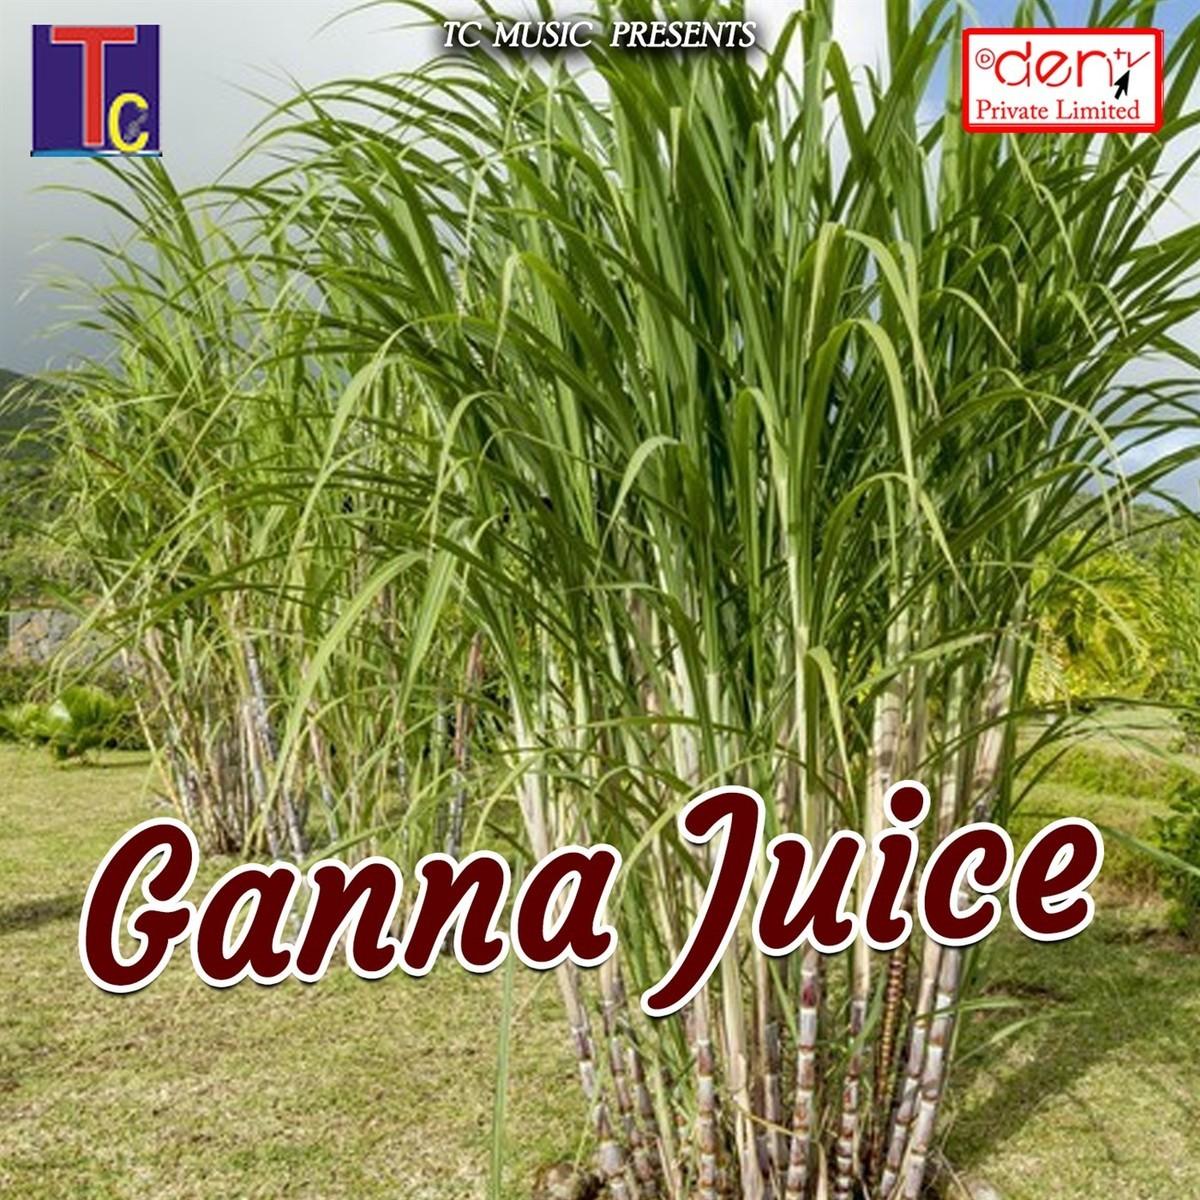 Ganna Juice Songs Download: Ganna Juice MP3 Bhojpuri Songs Online Free on  Gaana.com